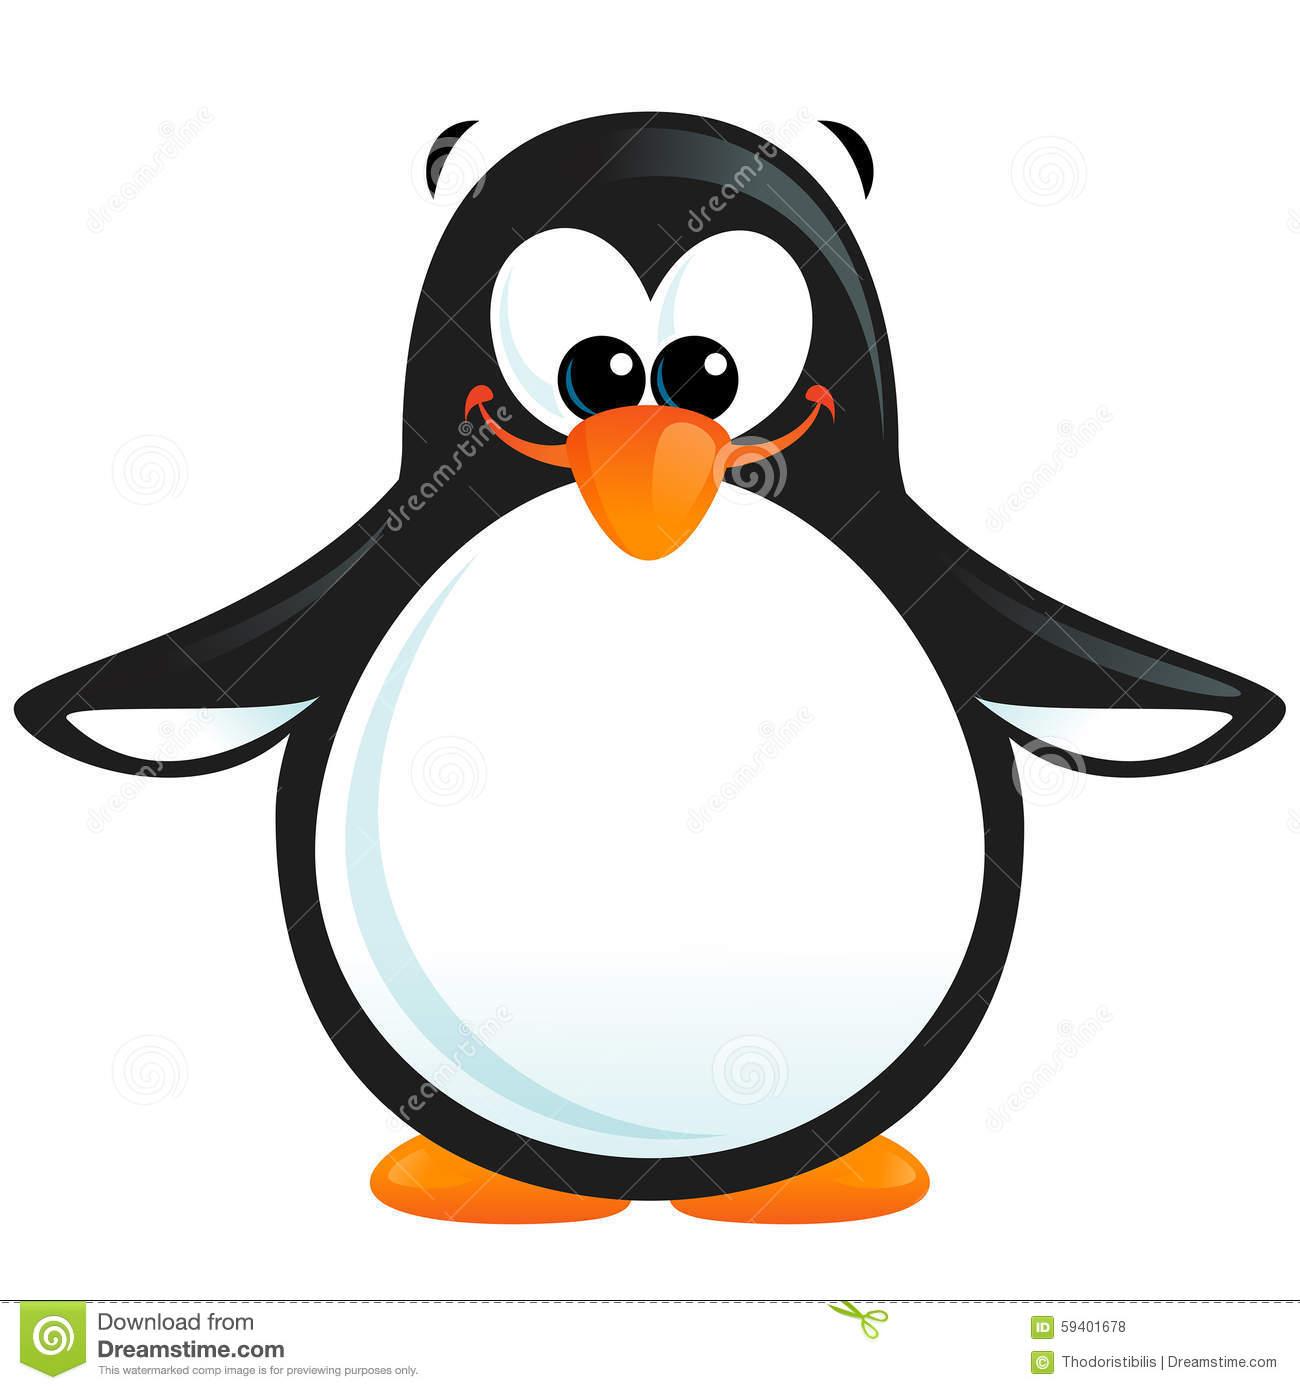 Happy Cute Cartoon Smiling Black White Penguin With Orange Beak.